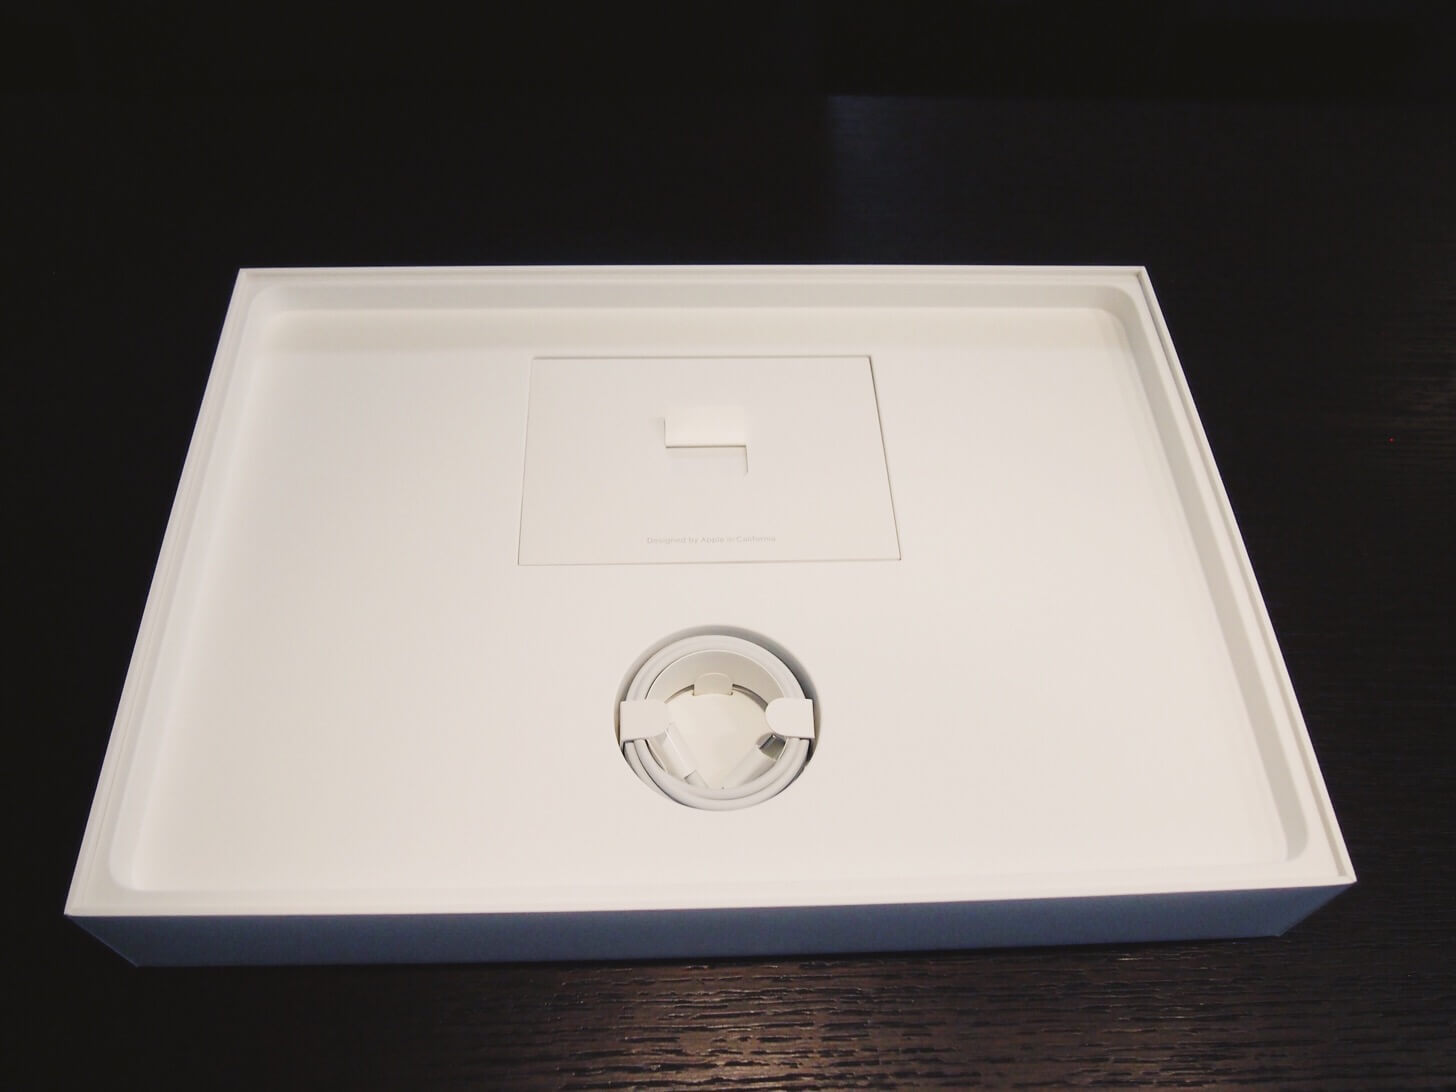 macbookpro2016-15inch-8